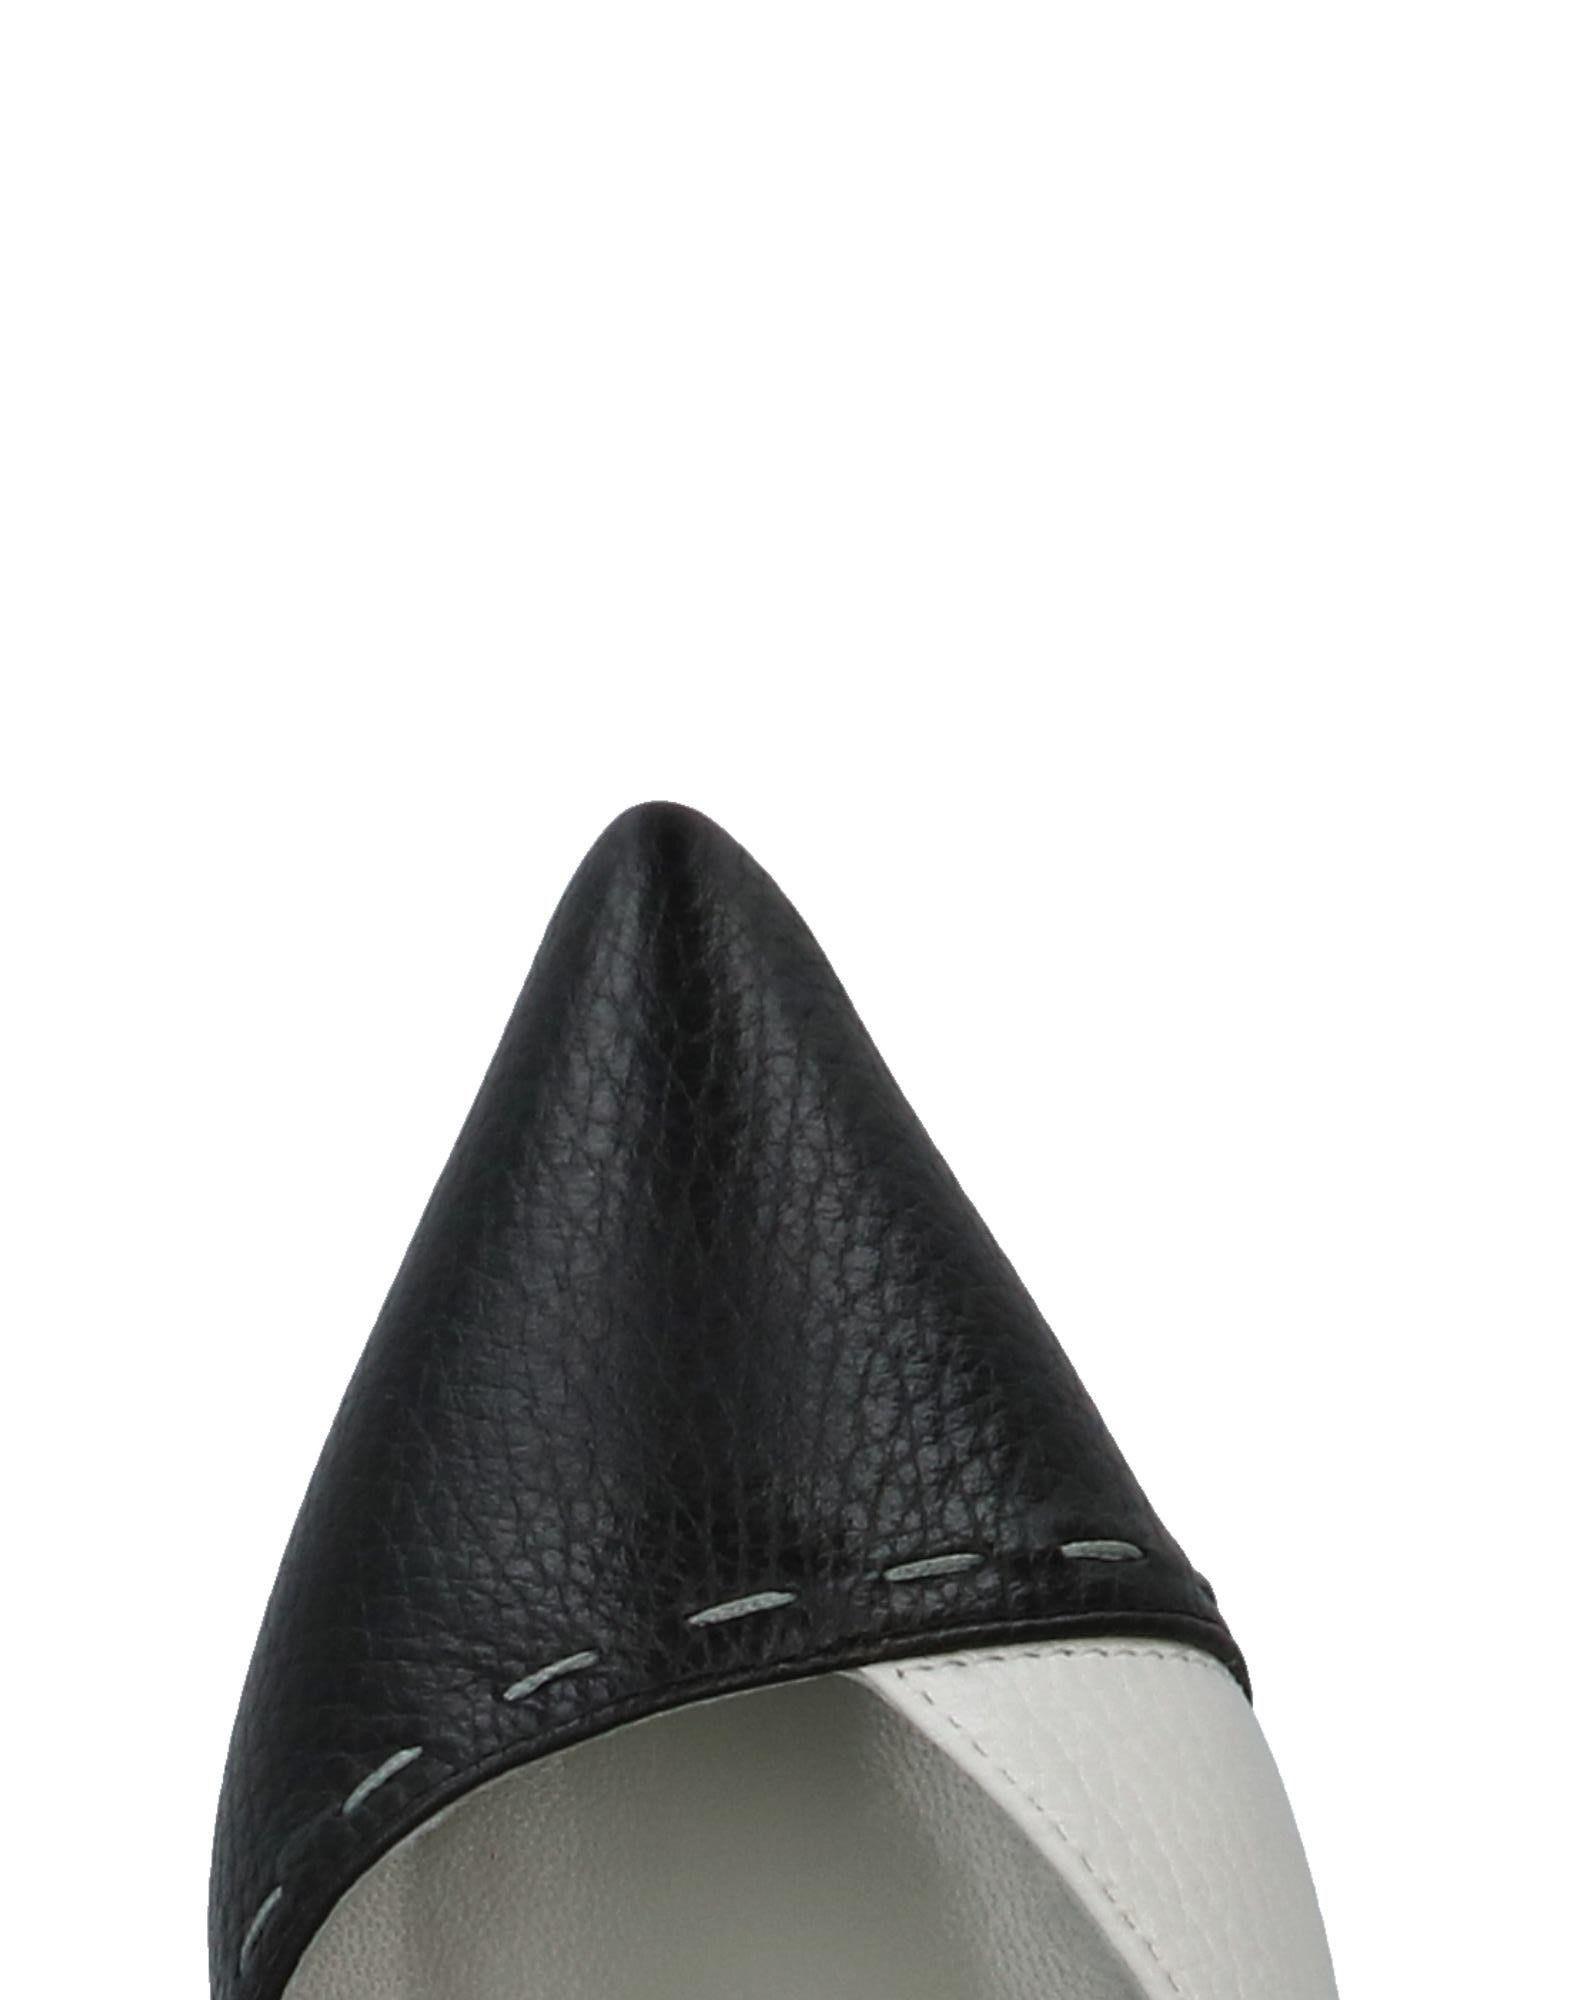 Emanuela Passeri Pumps Damen  11331728CI Gute Qualität beliebte Schuhe